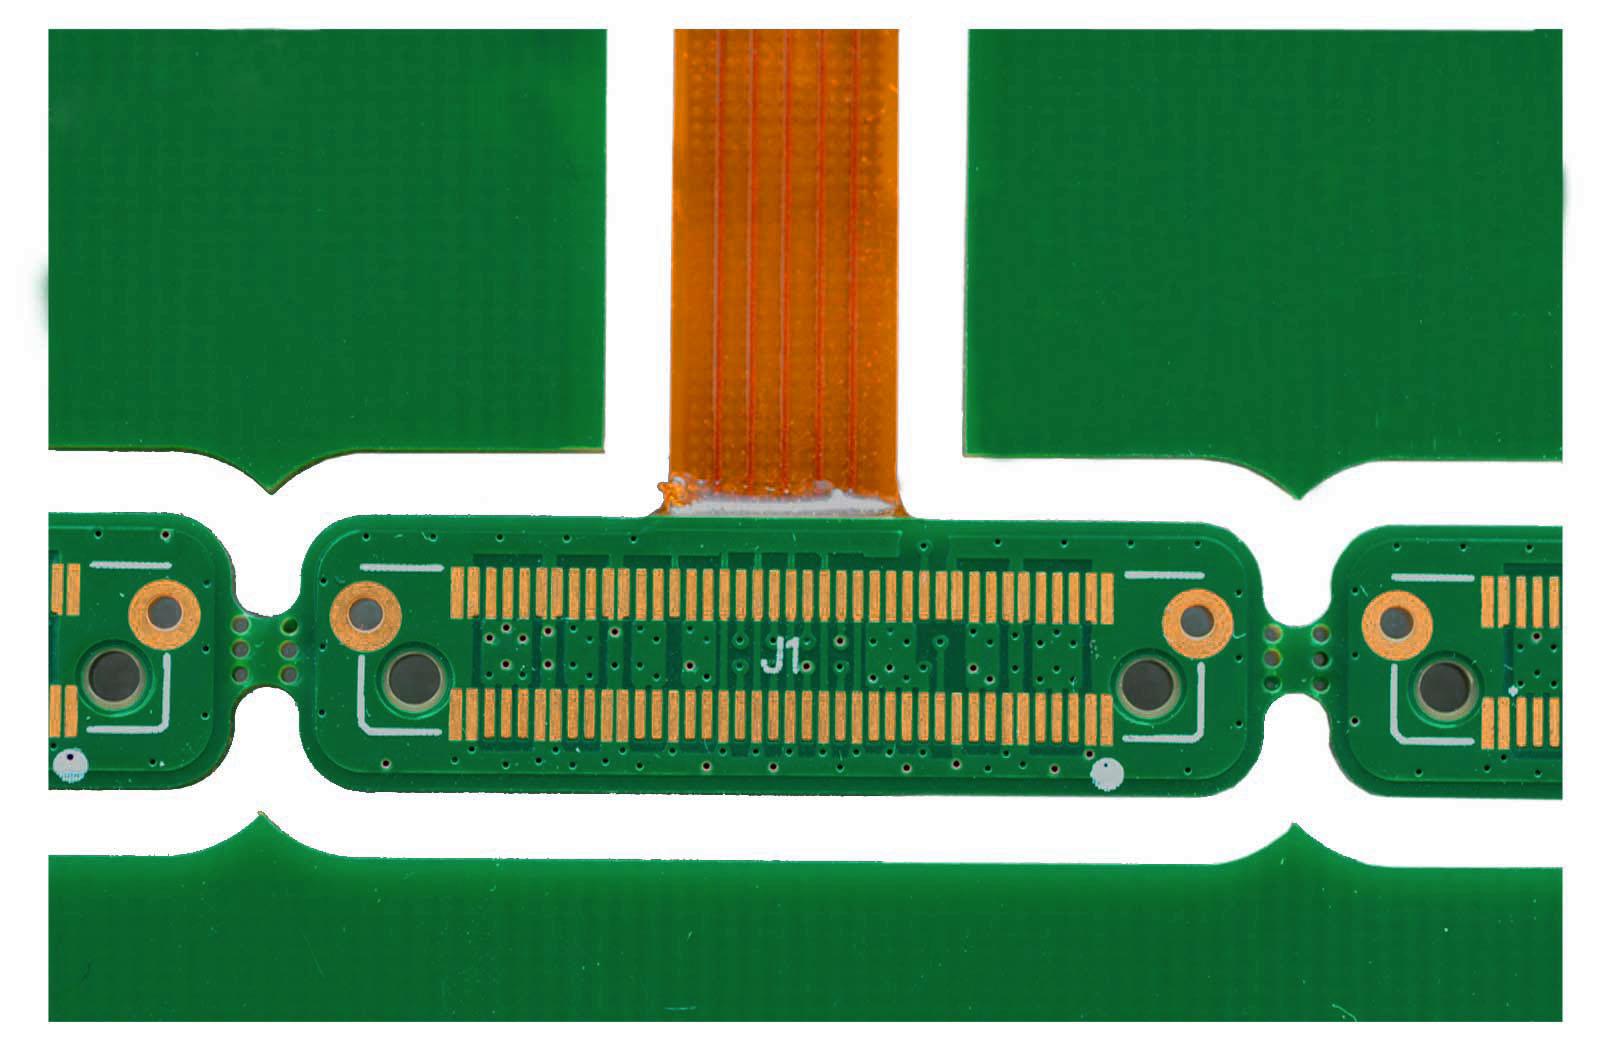 Photos Of Ceramic Pcb Dcb Thin Film Layer 1 Oz Flexible Printed Circuit Board And Cover Supplier Bfr13009 6 Rigid Flex